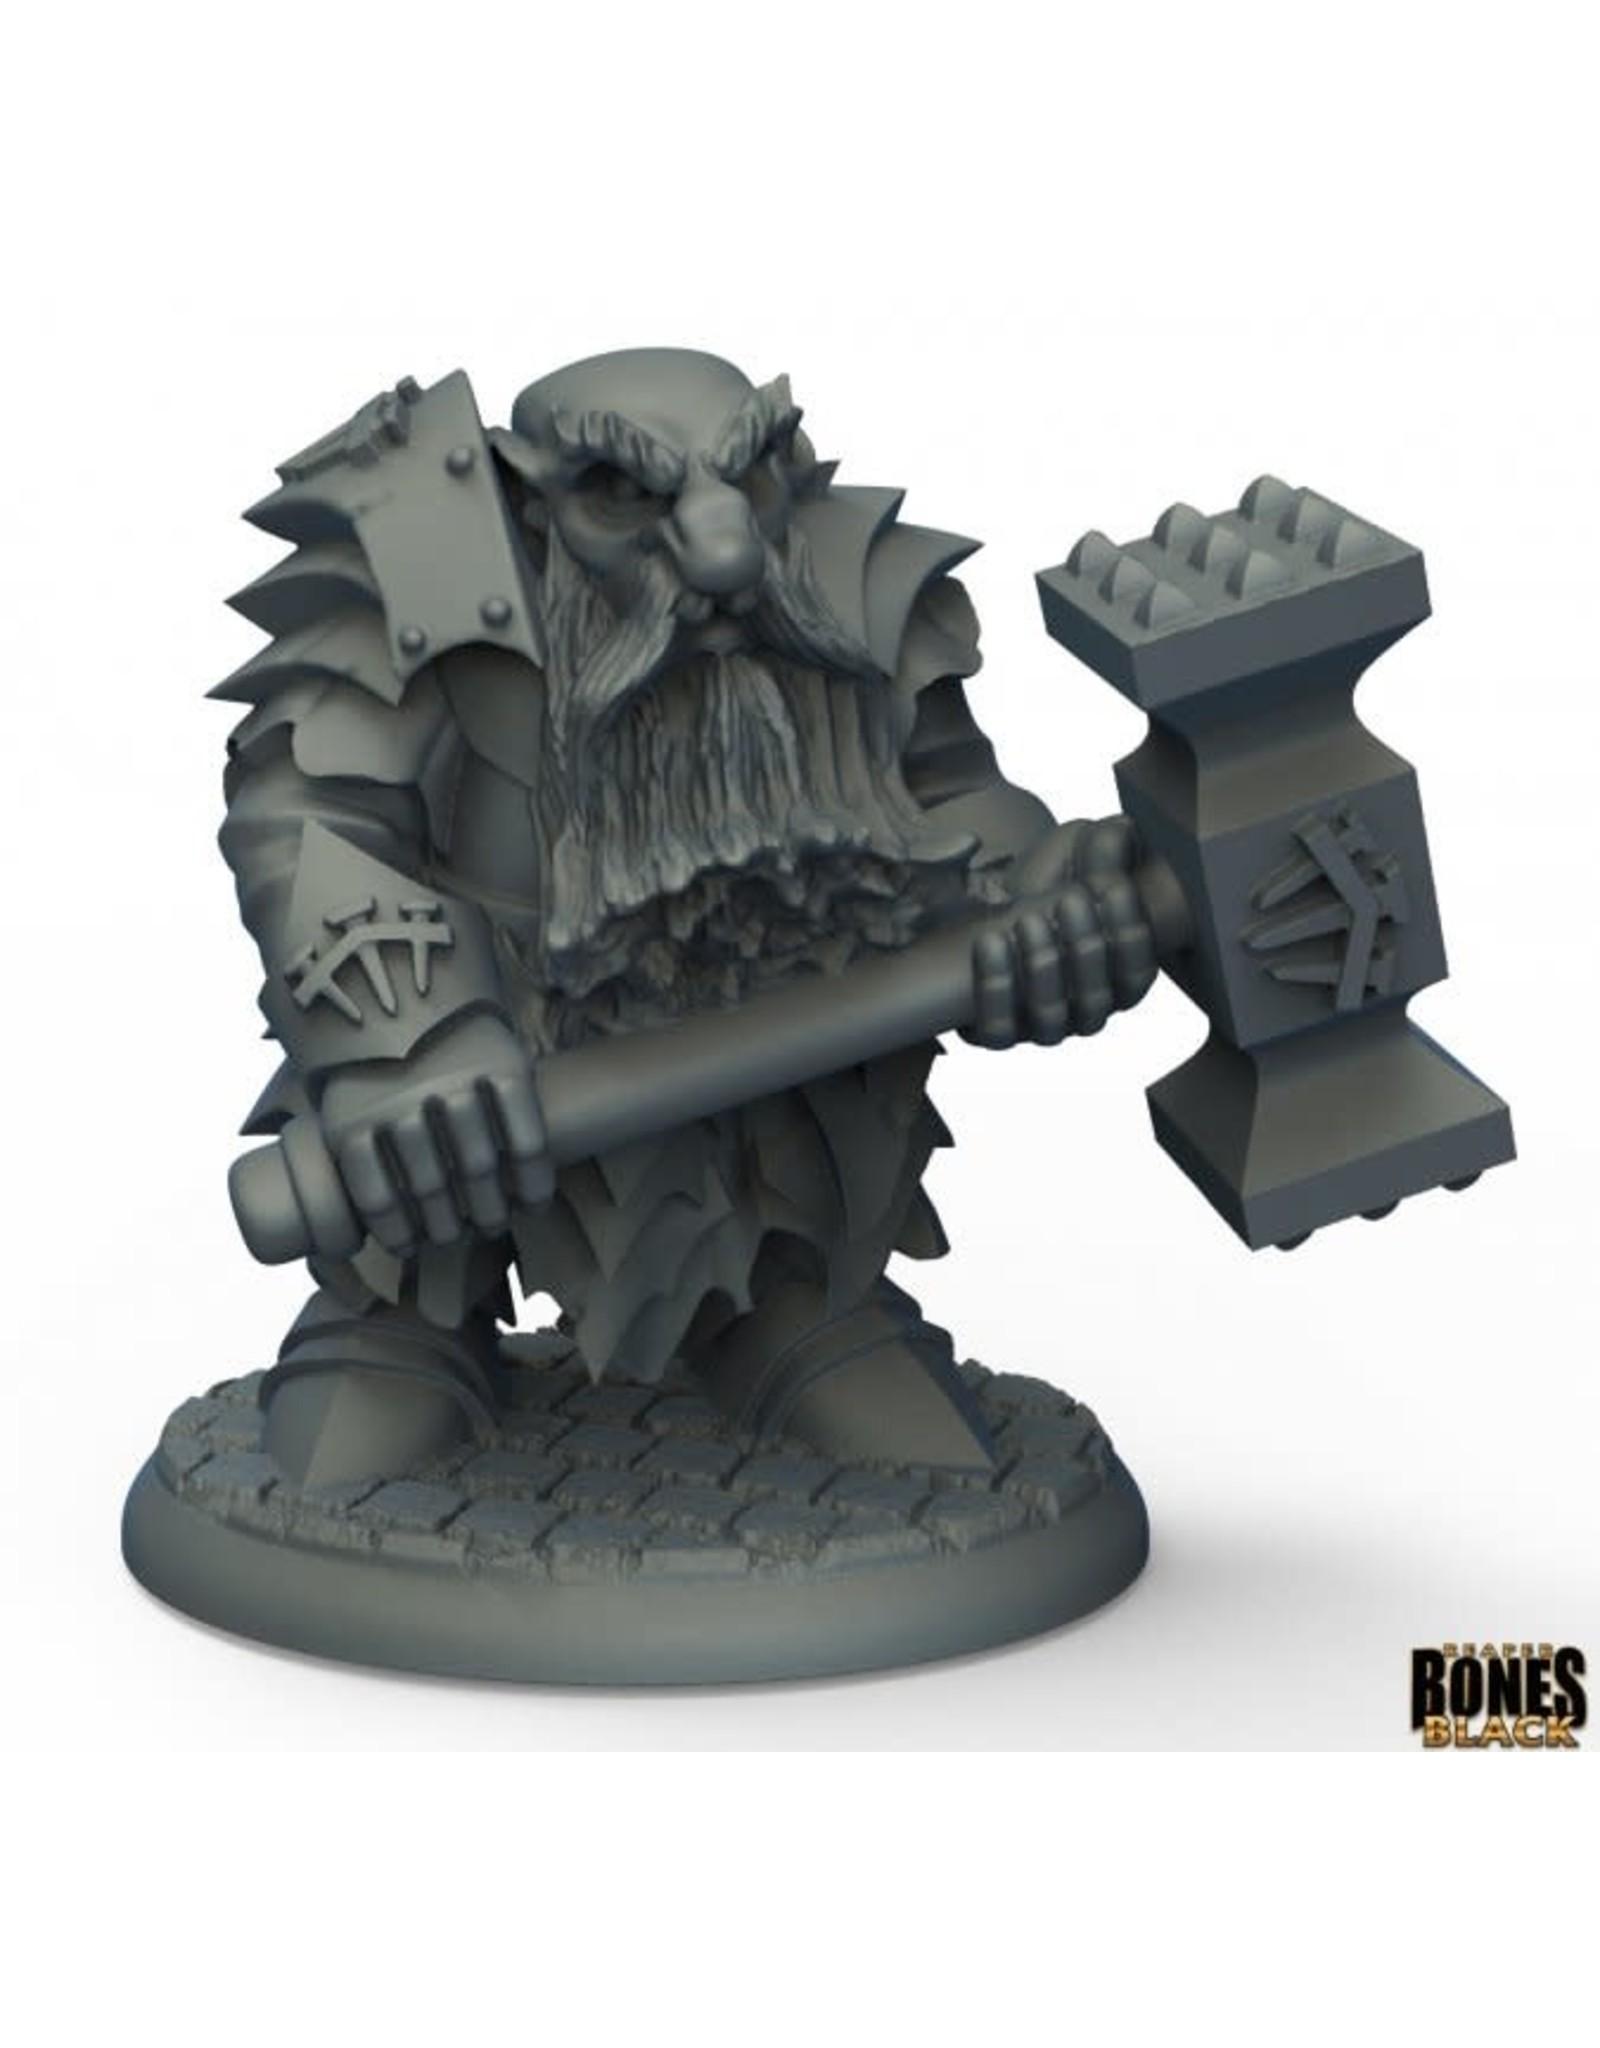 Reaper Reaper: Bones Black:  Dark Dwarf Pounder